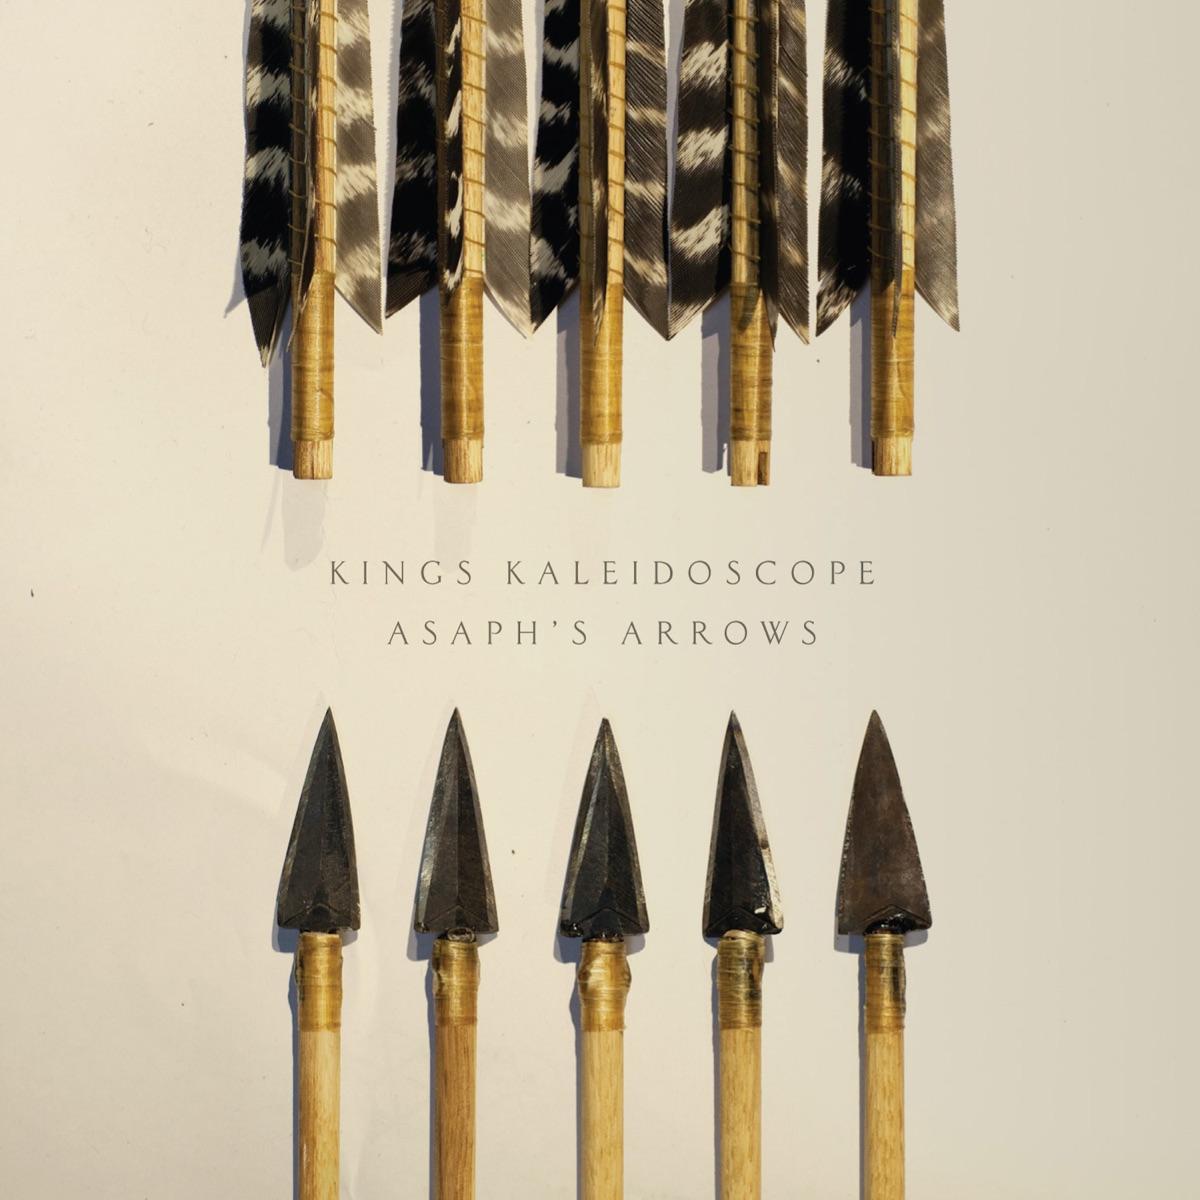 Asaphs Arrows - EP Kings Kaleidoscope CD cover